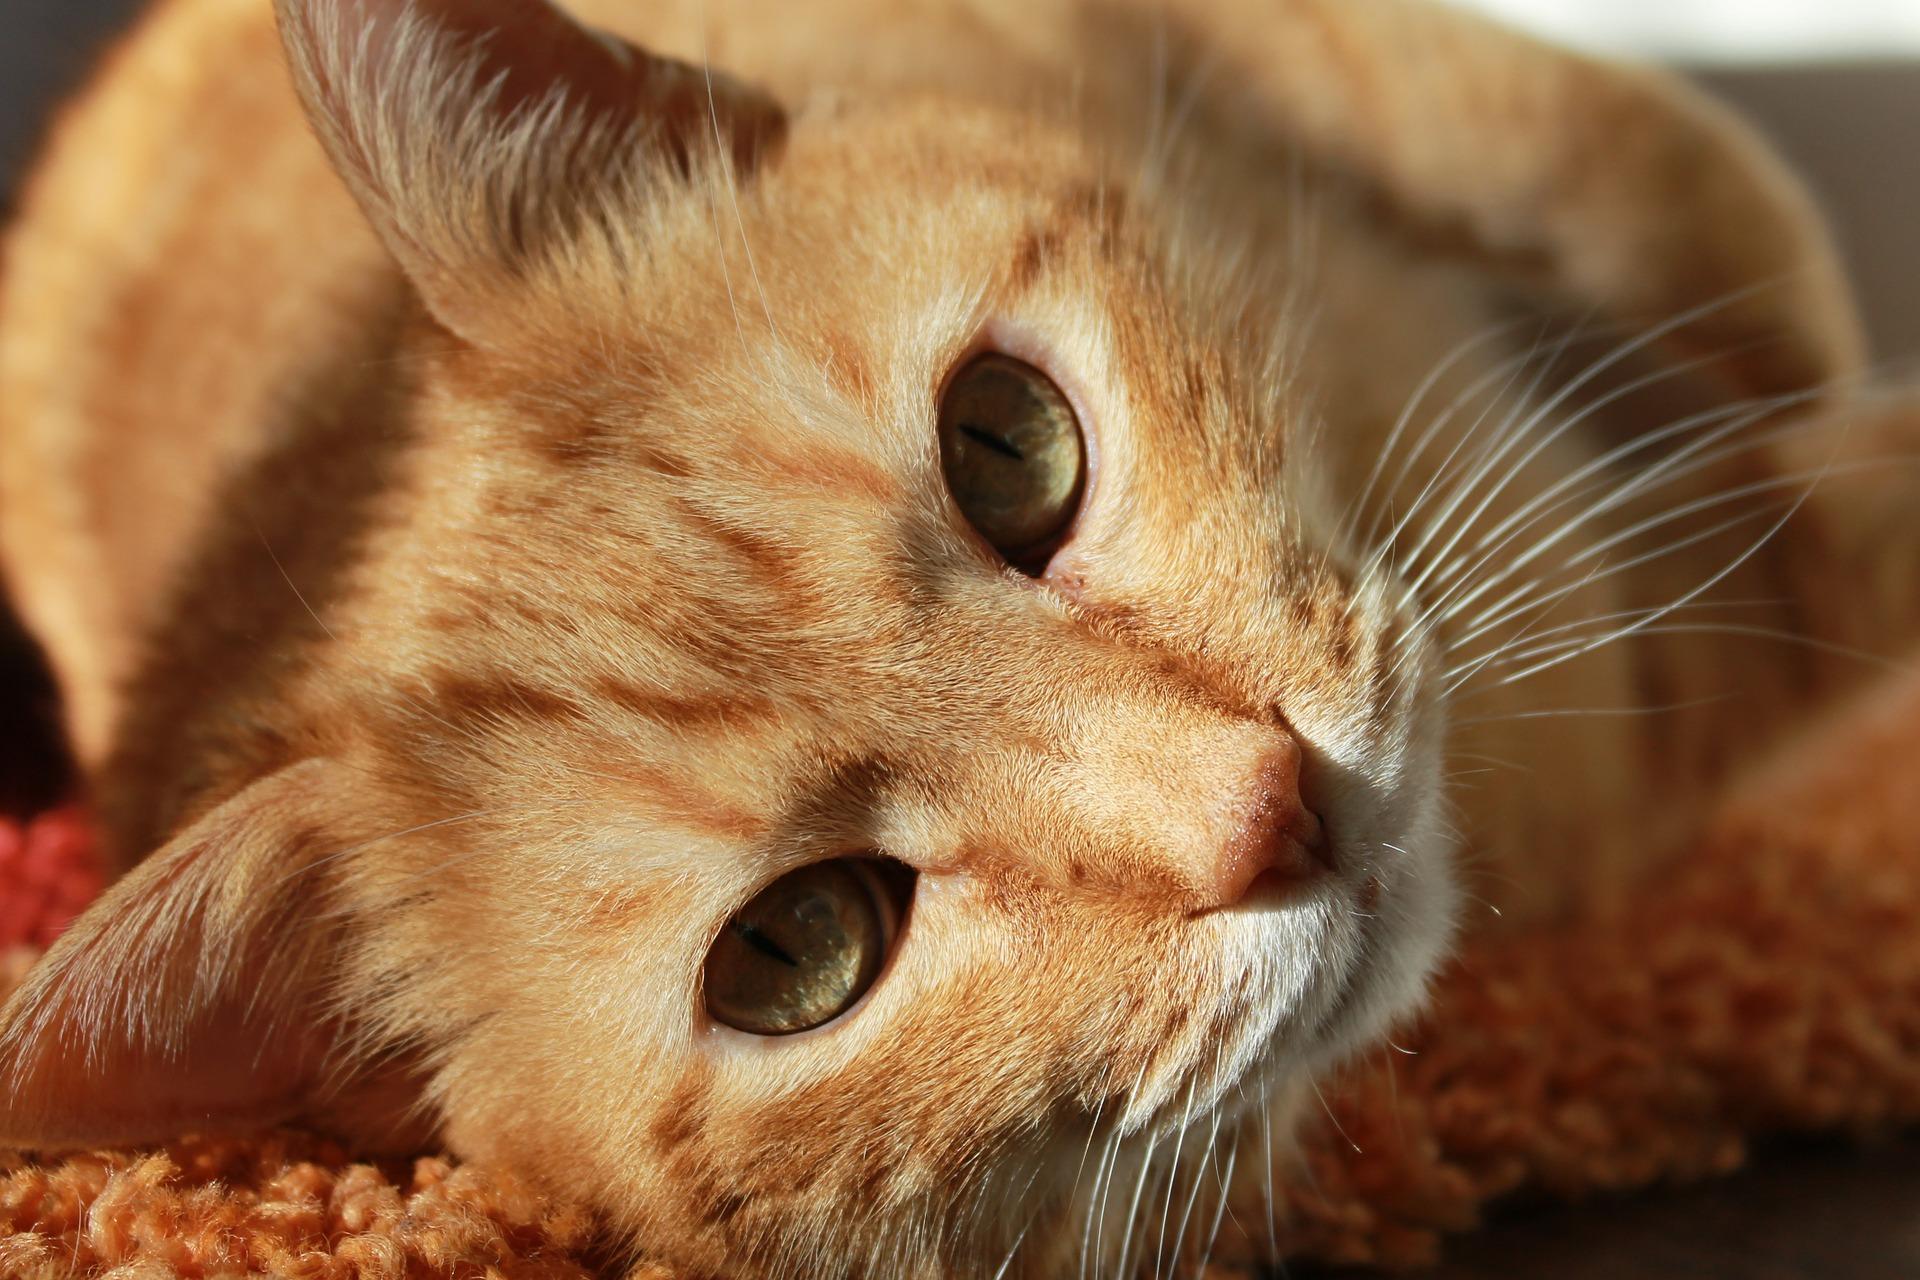 gato, mascota, mirada, ojos, amigo, marrón - Fondos de Pantalla HD - professor-falken.com